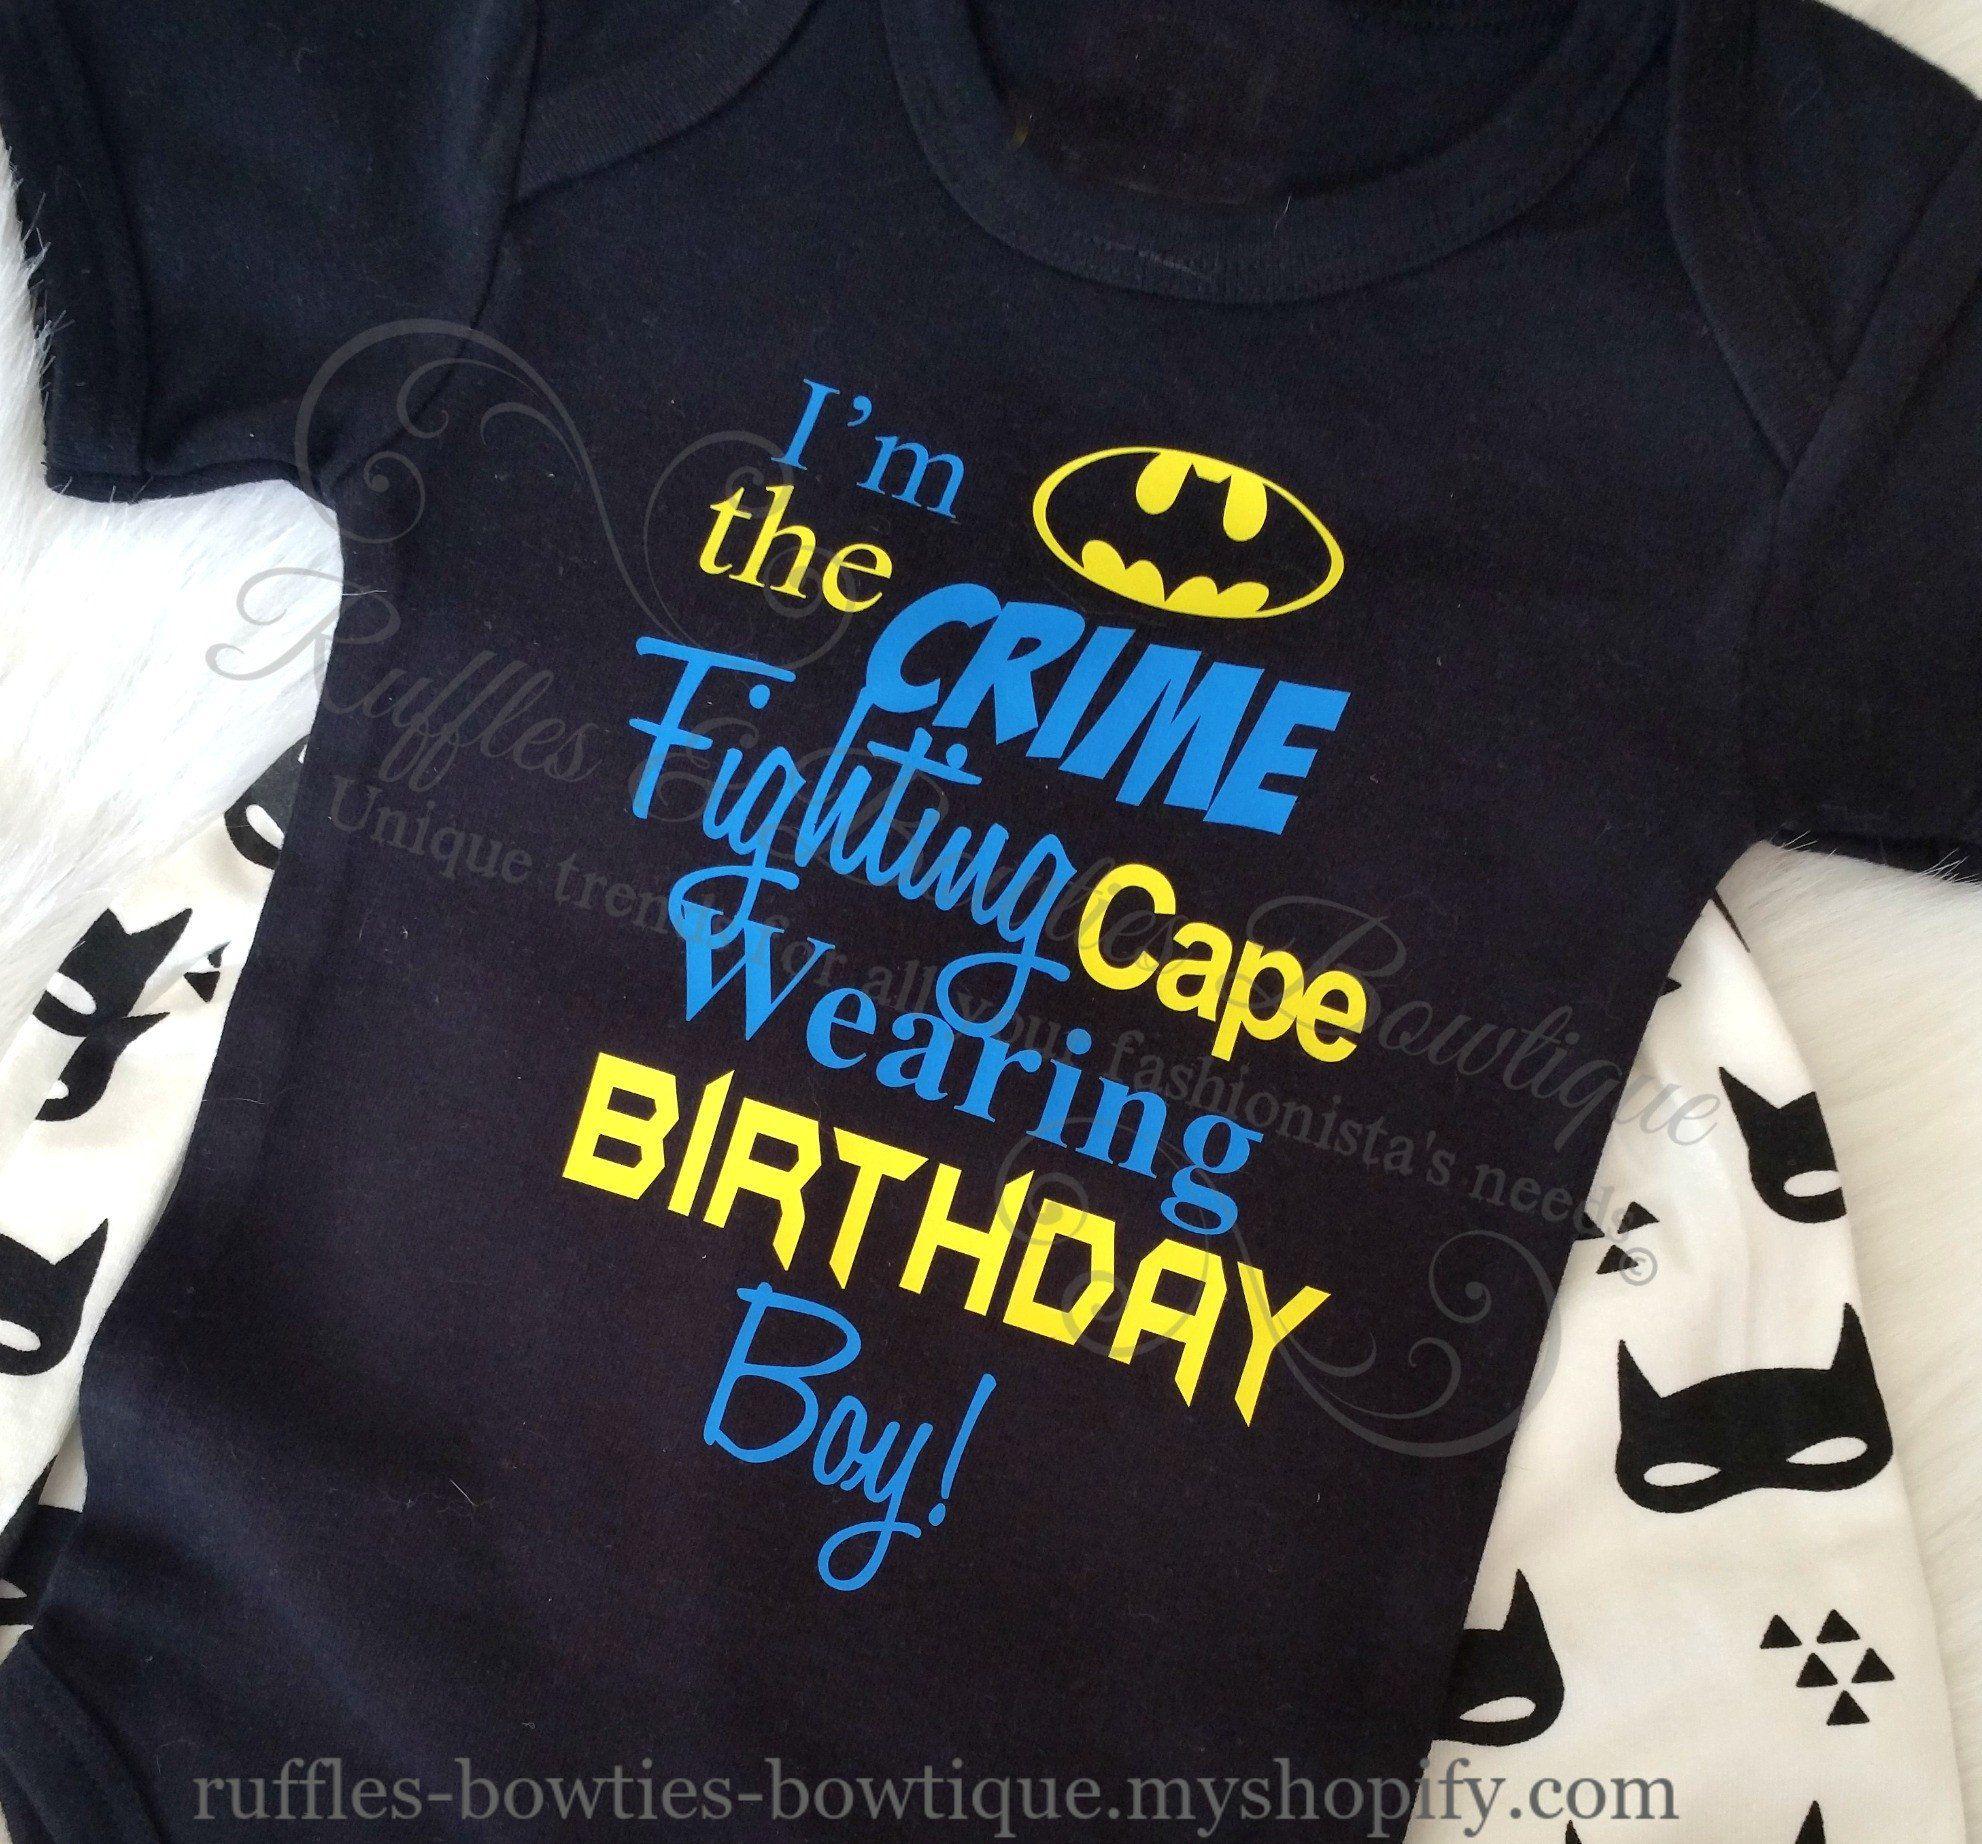 Bat Man Birthday Shirt Im A The Crime Fighting Cape Wearing